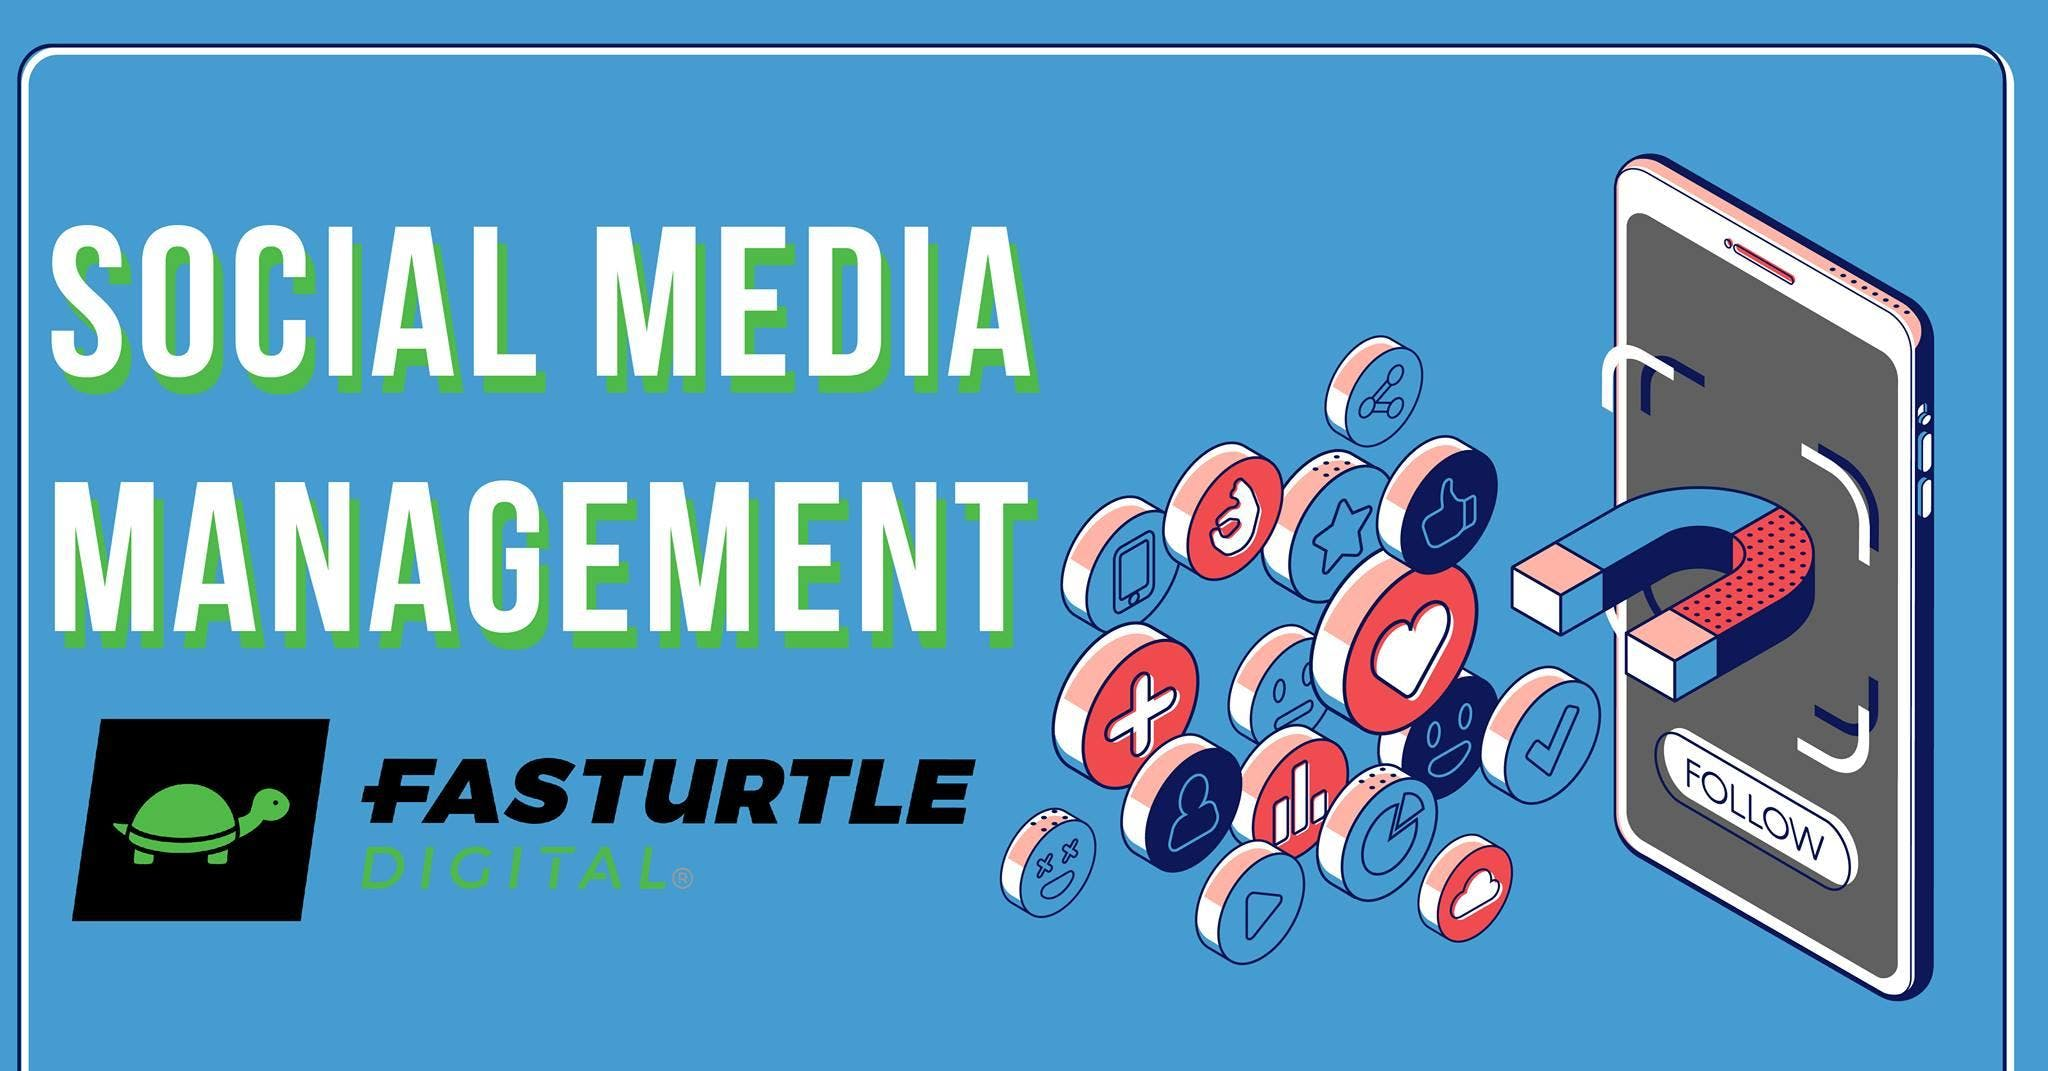 Education Class: Fasturtle Digital - Social Media Management